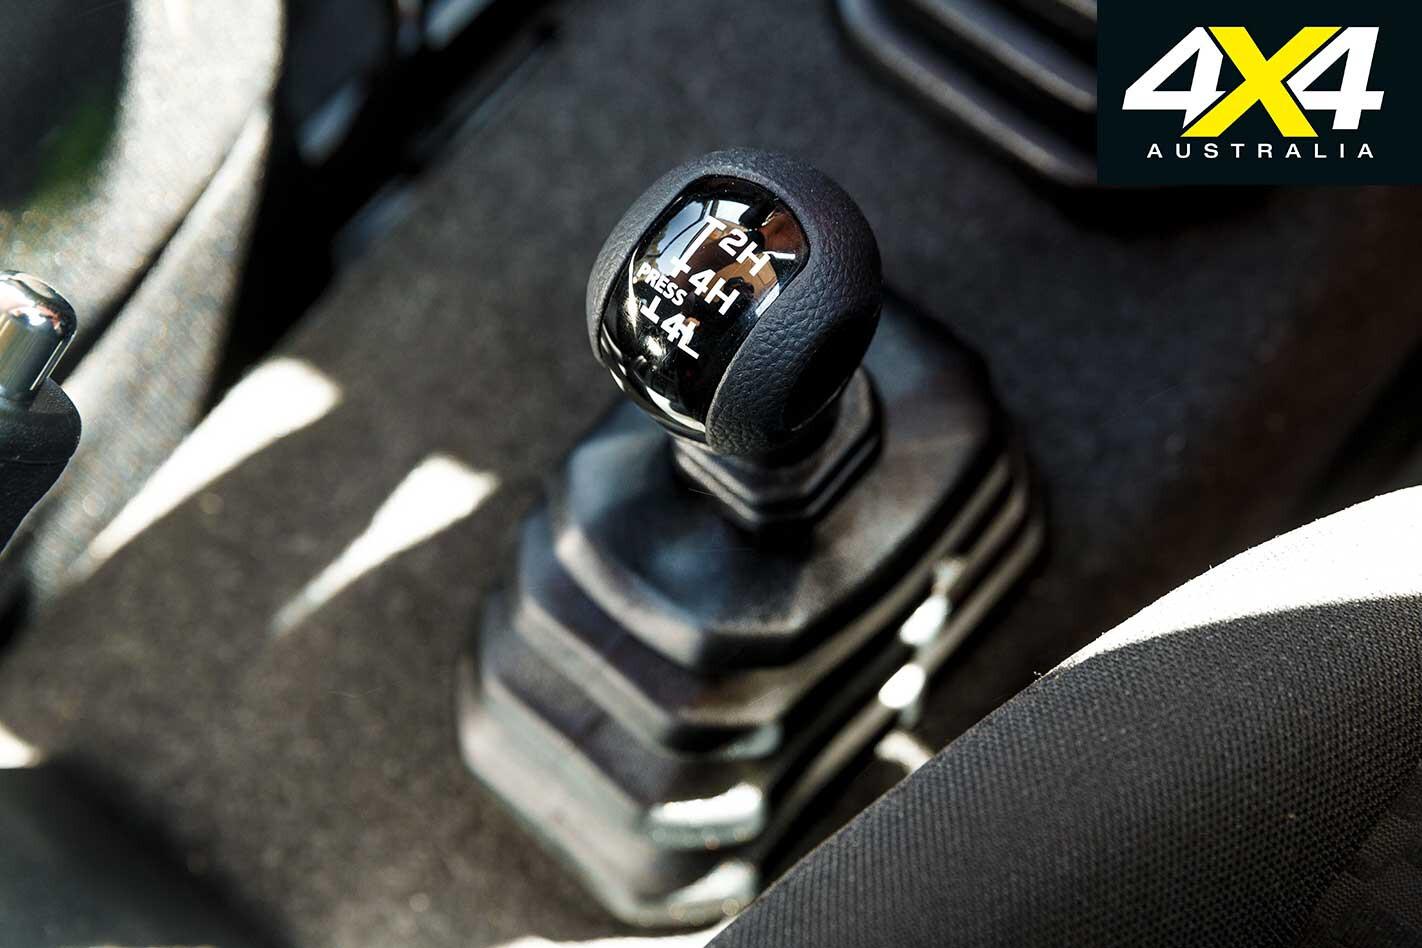 2019 Suzuki Jimny 4 WD Shifter Jpg